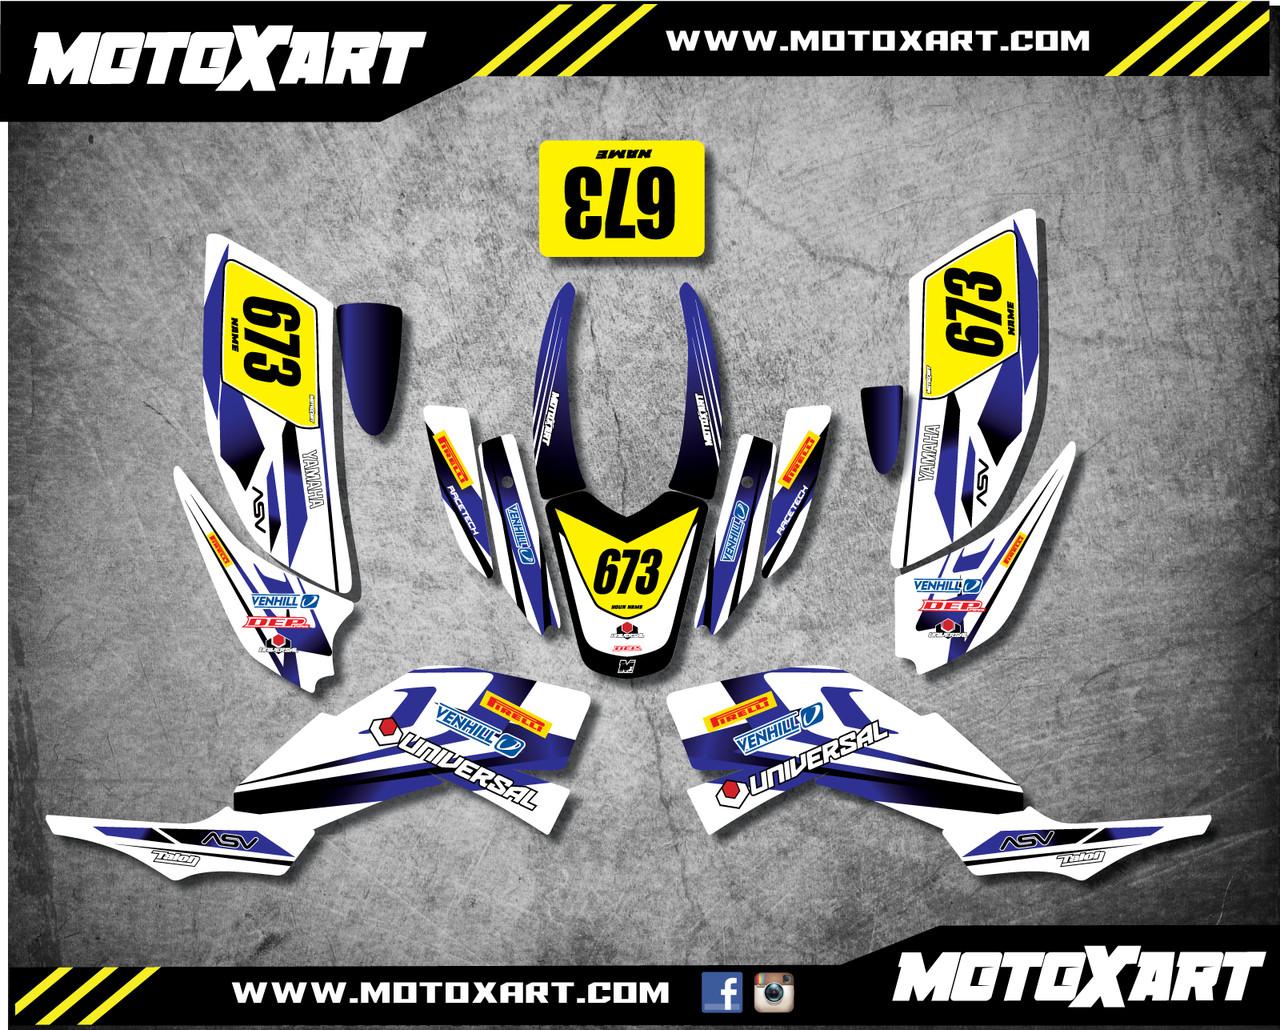 QUAD ATV Full custom graphics kit Storm Style Sticker Kit - MotoXart